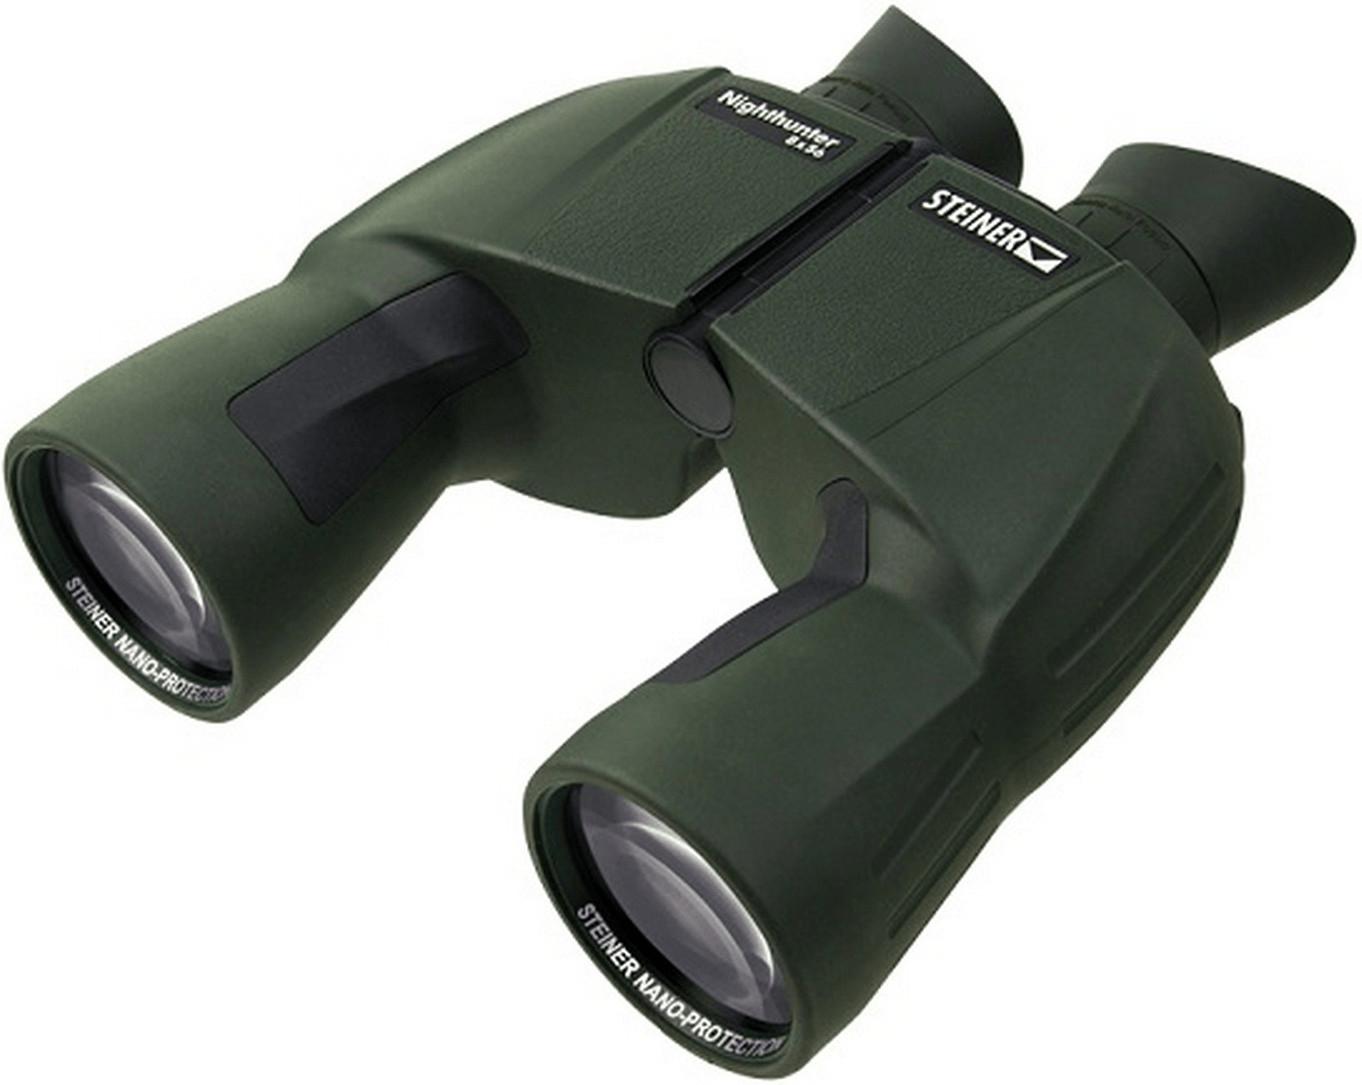 Entfernungsmesser Jagd Frankonia : Wärmebildkamera jagd frankonia fürs jagen die